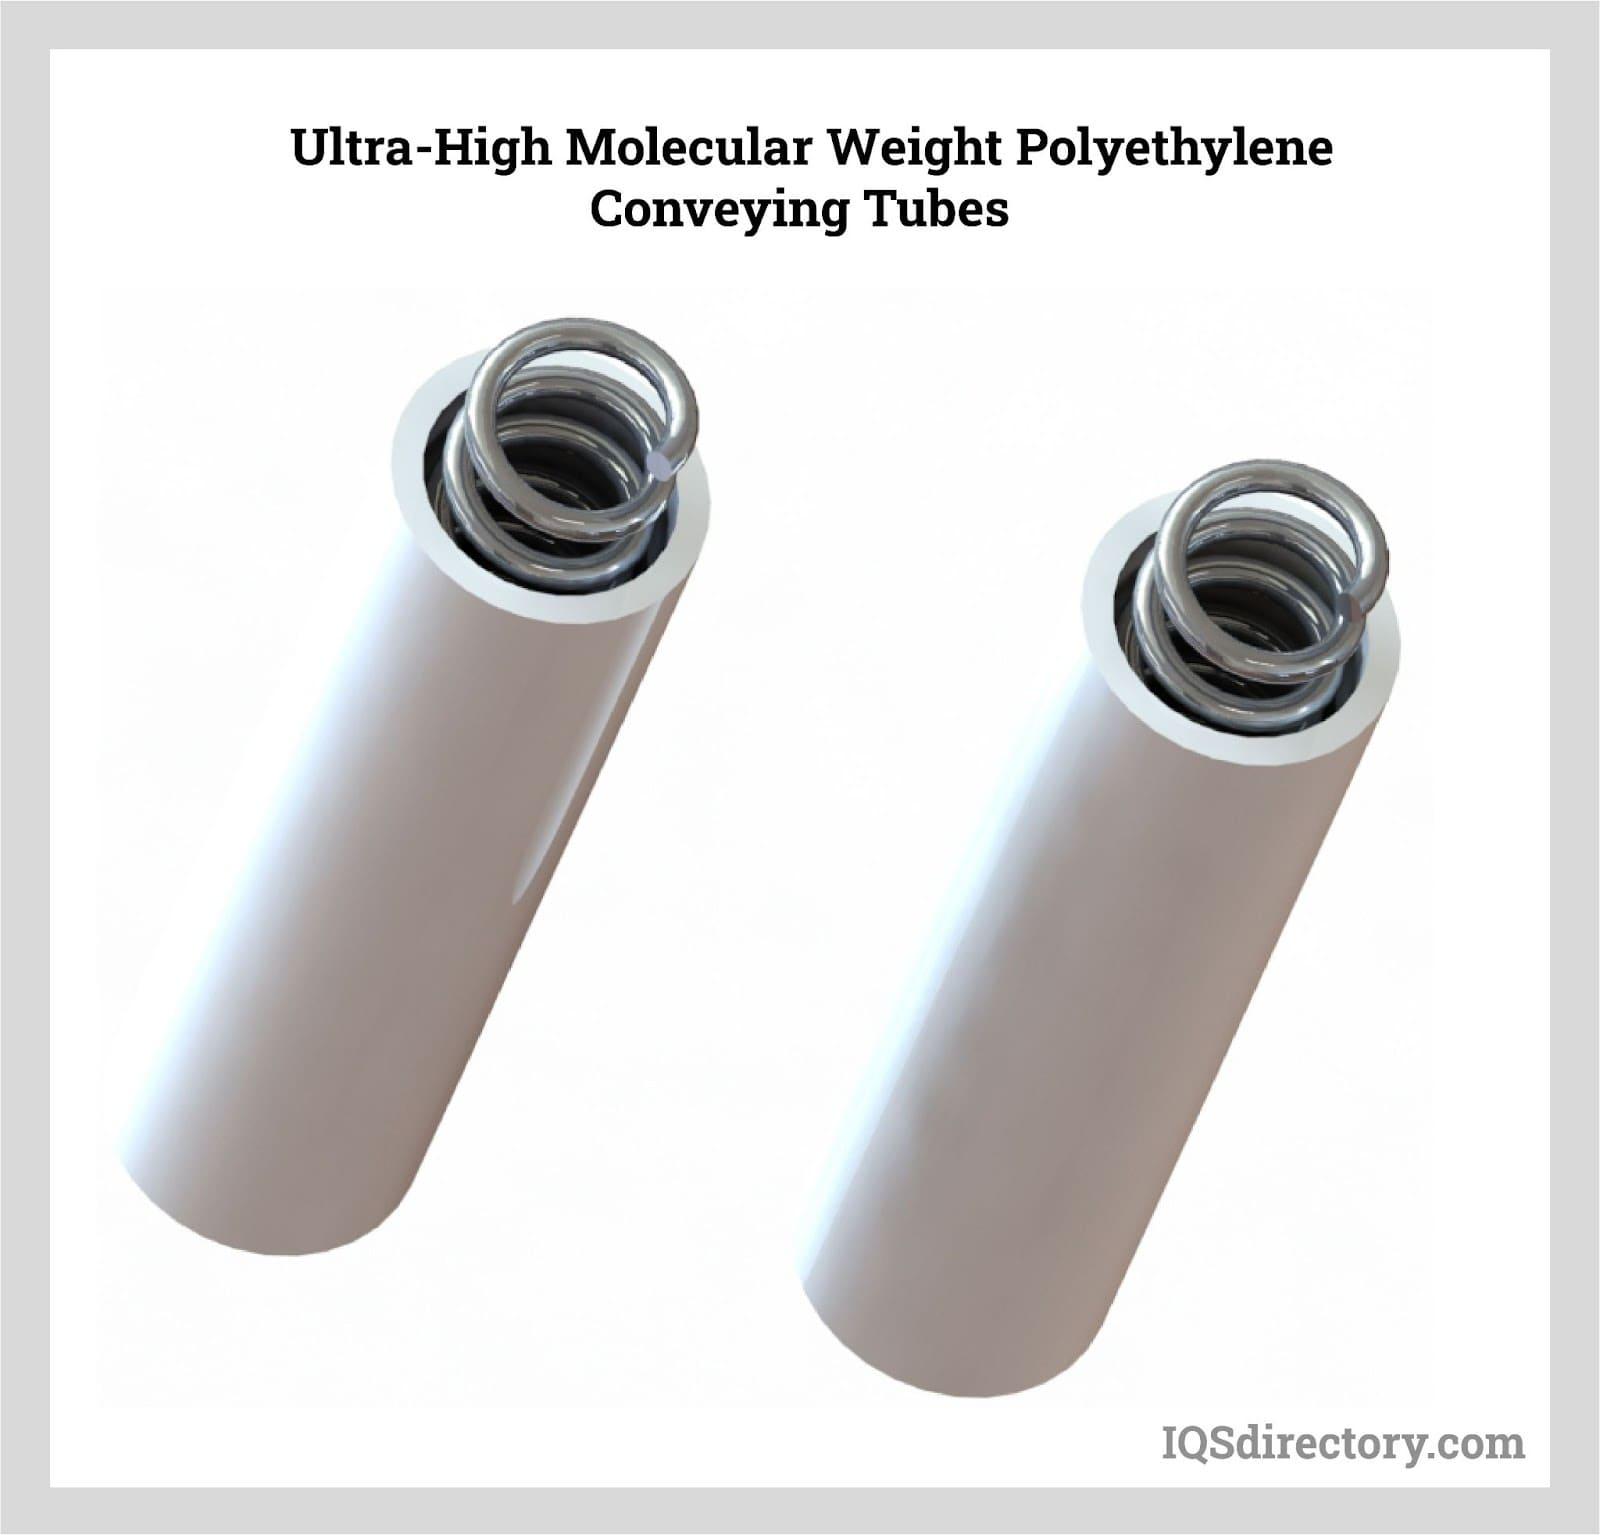 Ultra-High Molecular Weight Polyethylene Conveying Tubes